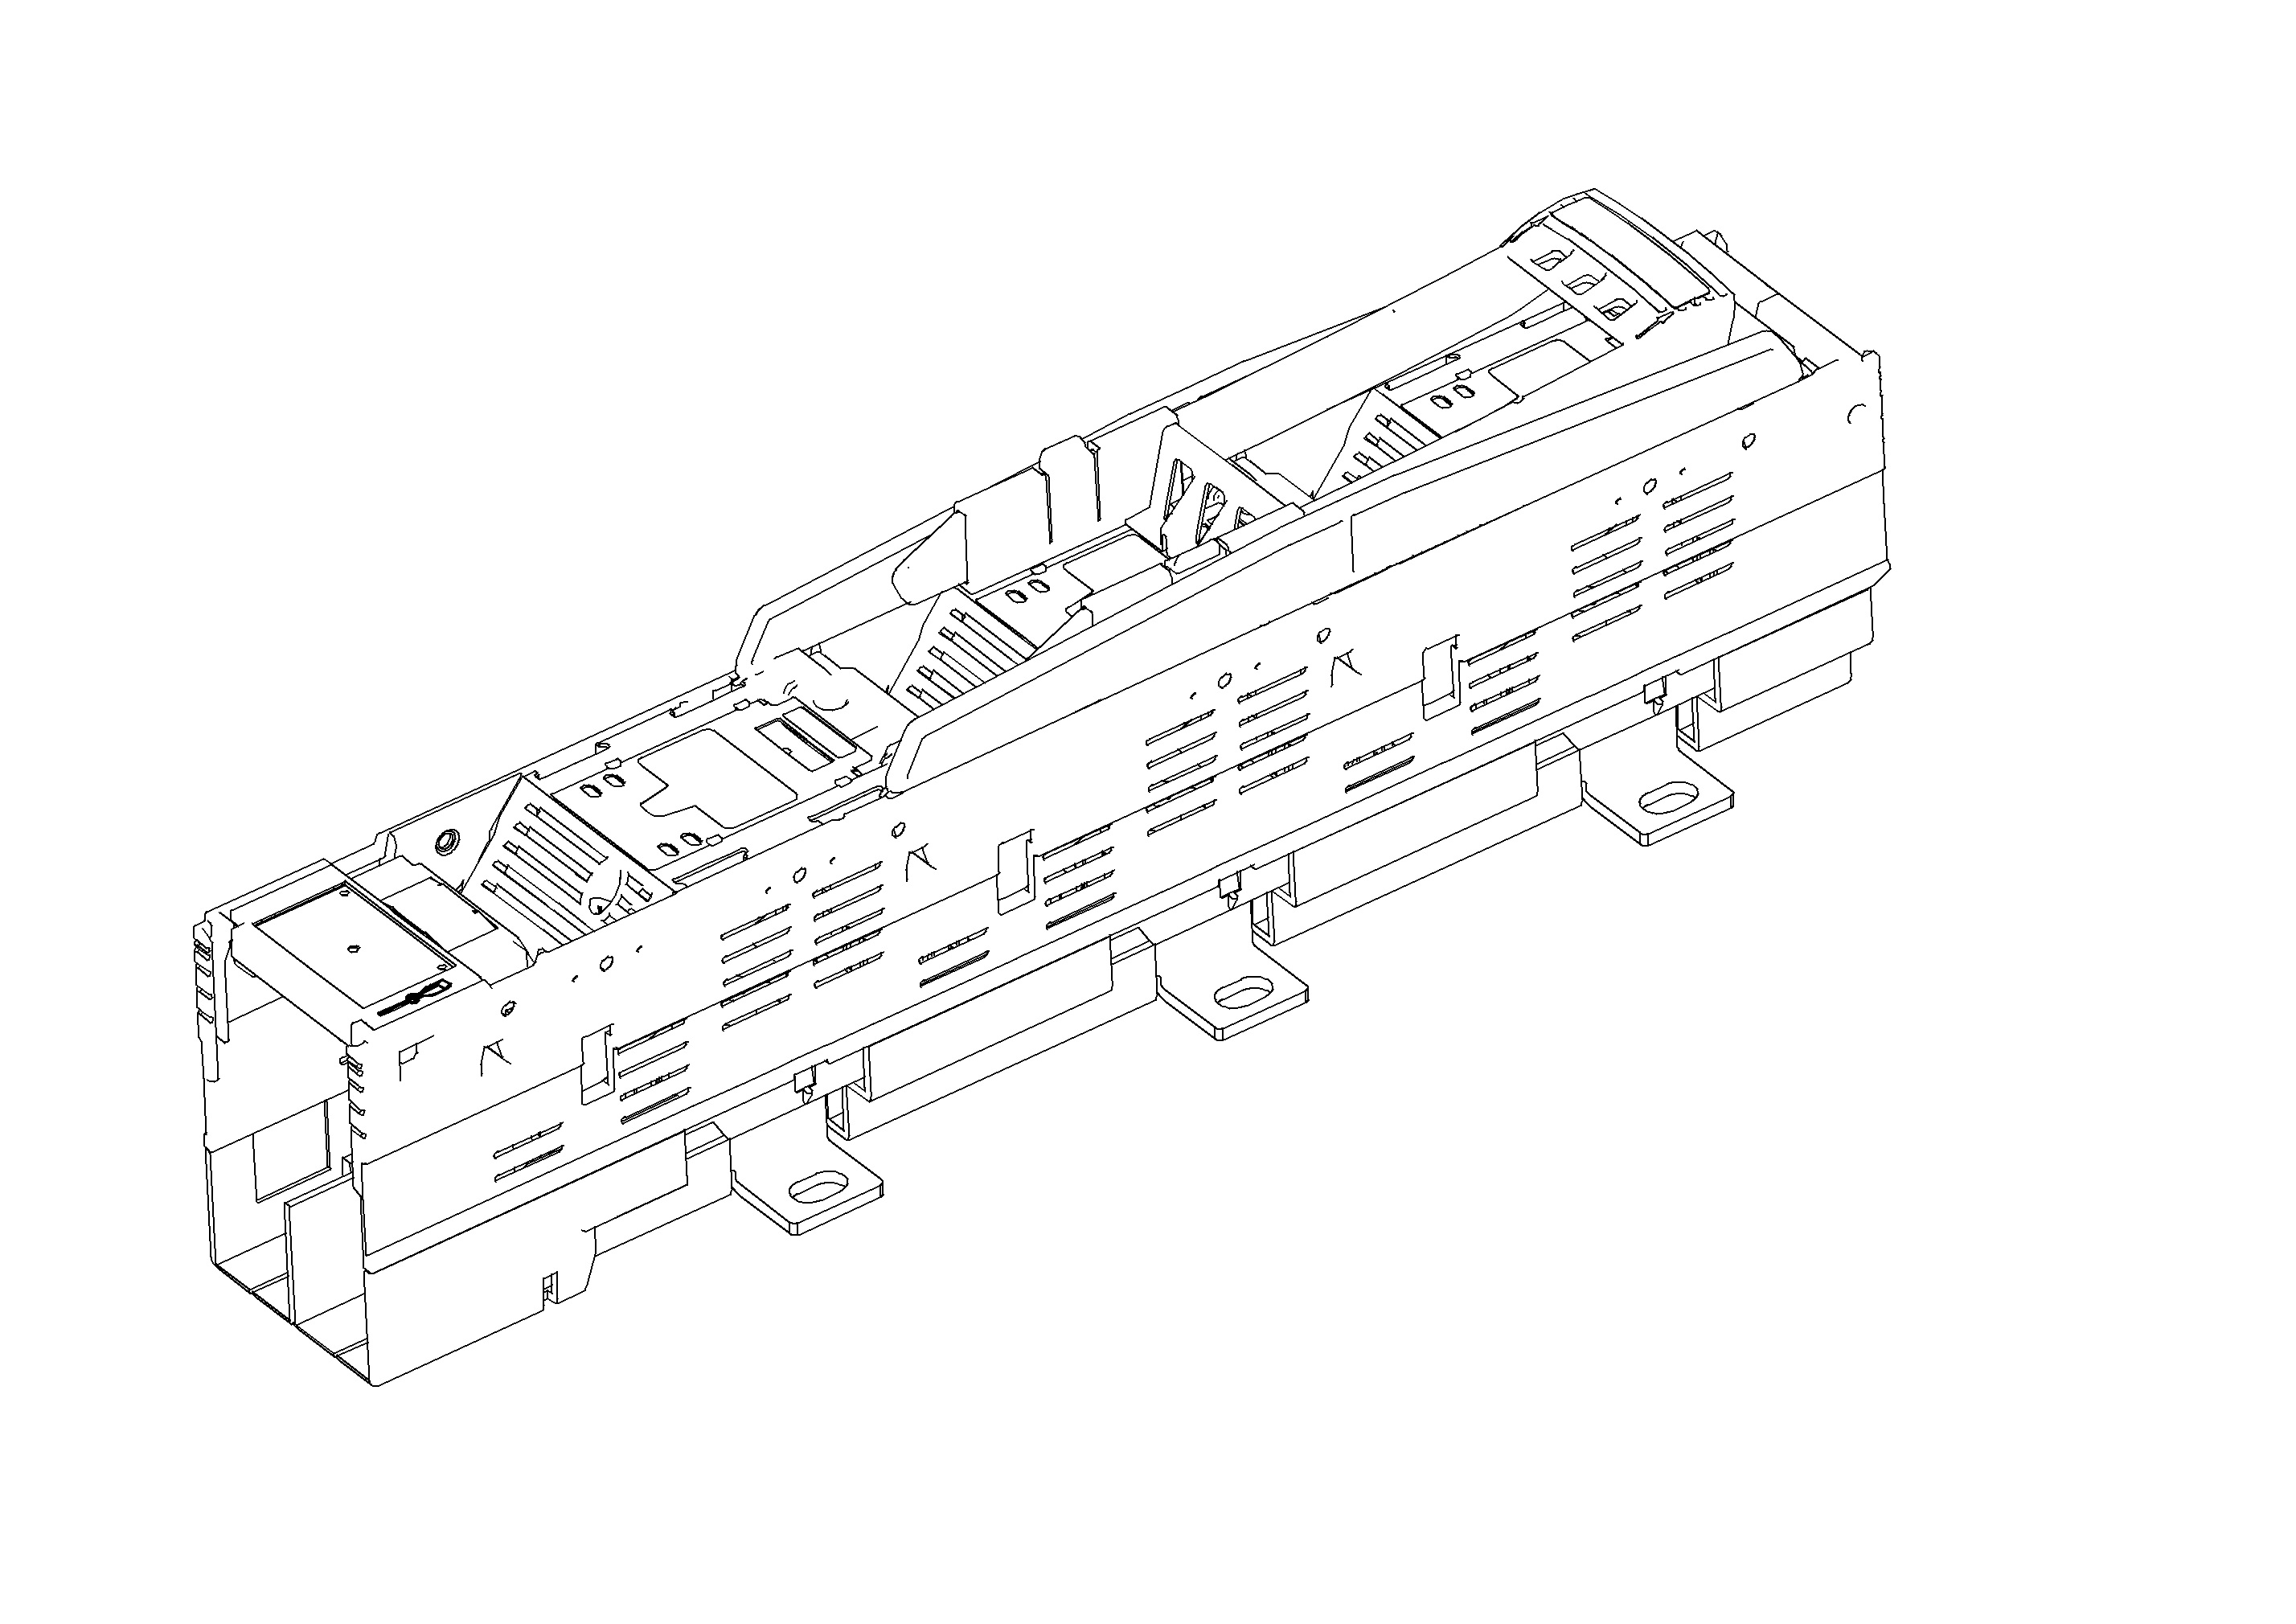 1 Stk Kuppelleiste Gr. 3 ARROW II Abgang rechts ISA05331--